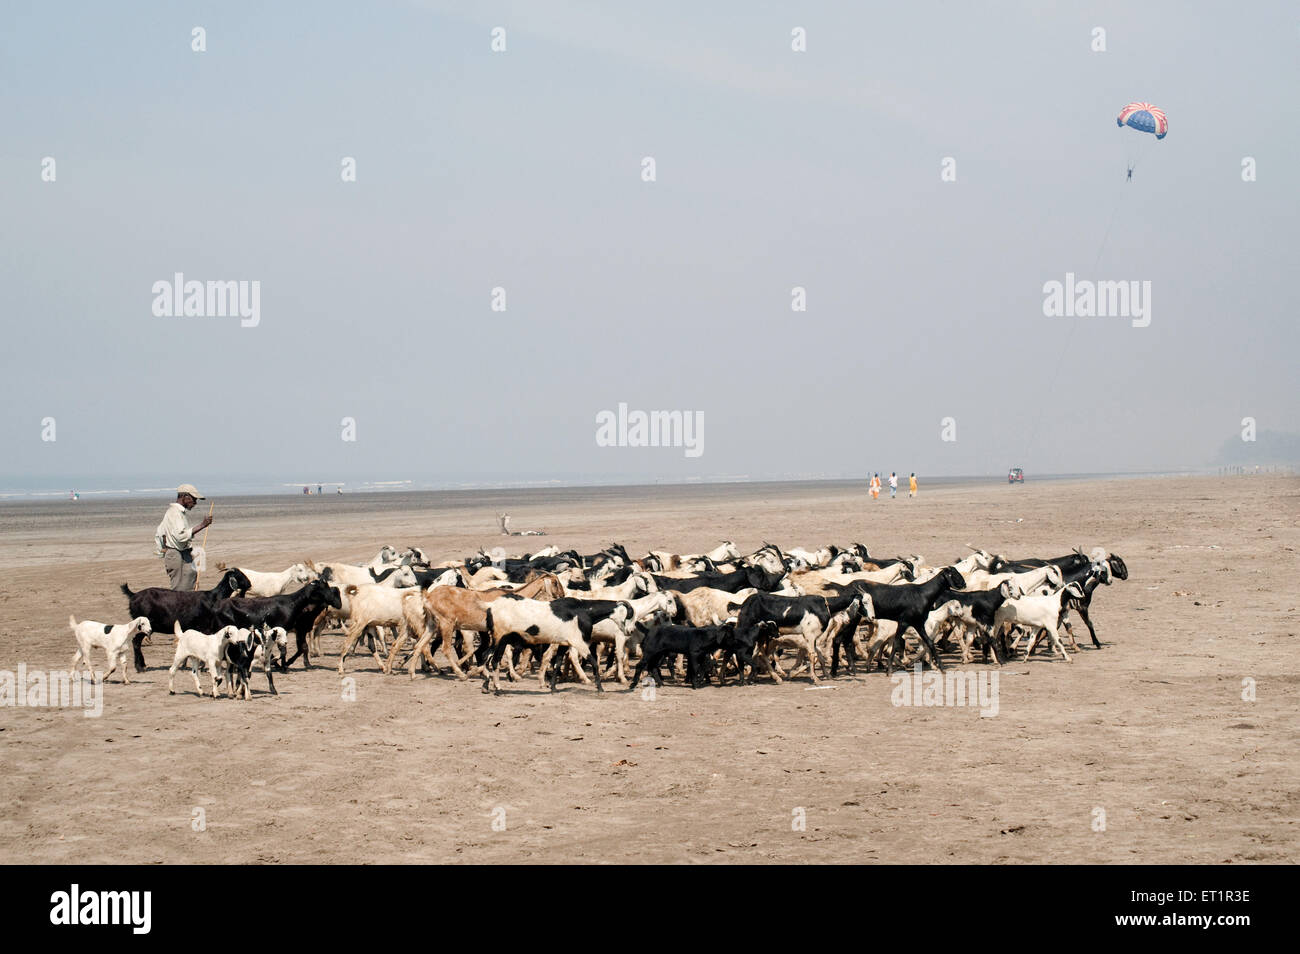 Shepherd with goats at nagaon beach ; Alibag ; Maharashtra ; India - Stock Image